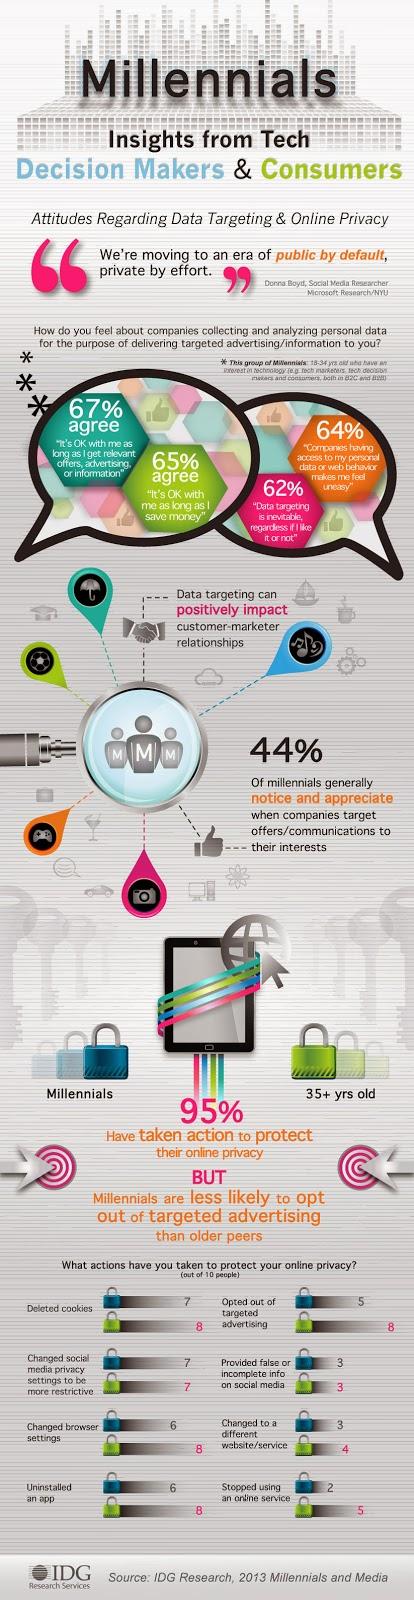 http://dailyinfographic.com/wp-content/uploads/2014/02/Millennials-Data-Targeting-Privacy_FINAL.jpg